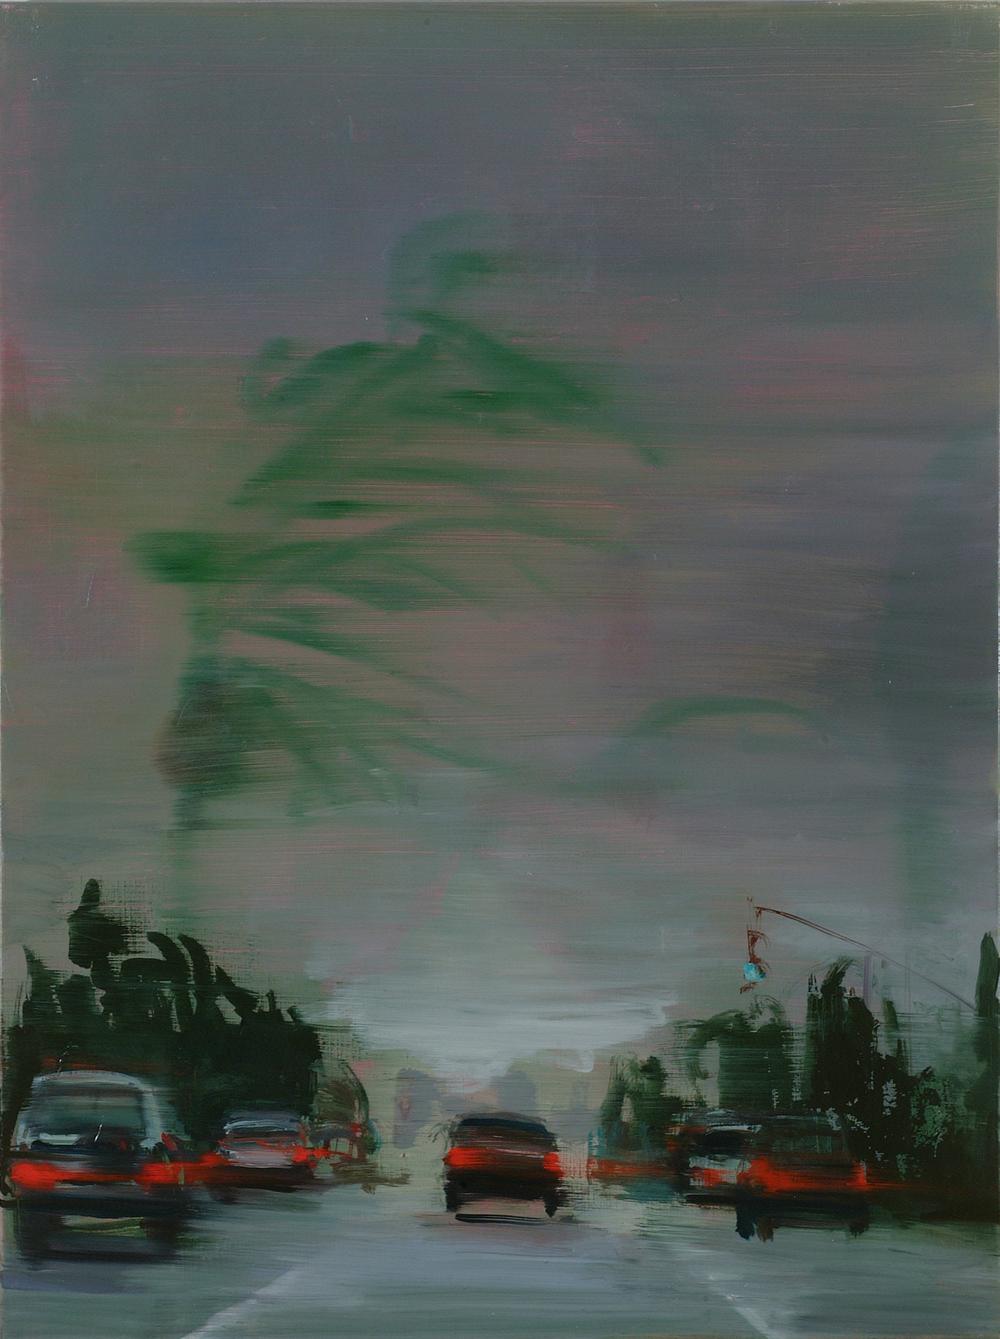 Post Card (Traffic), 2005